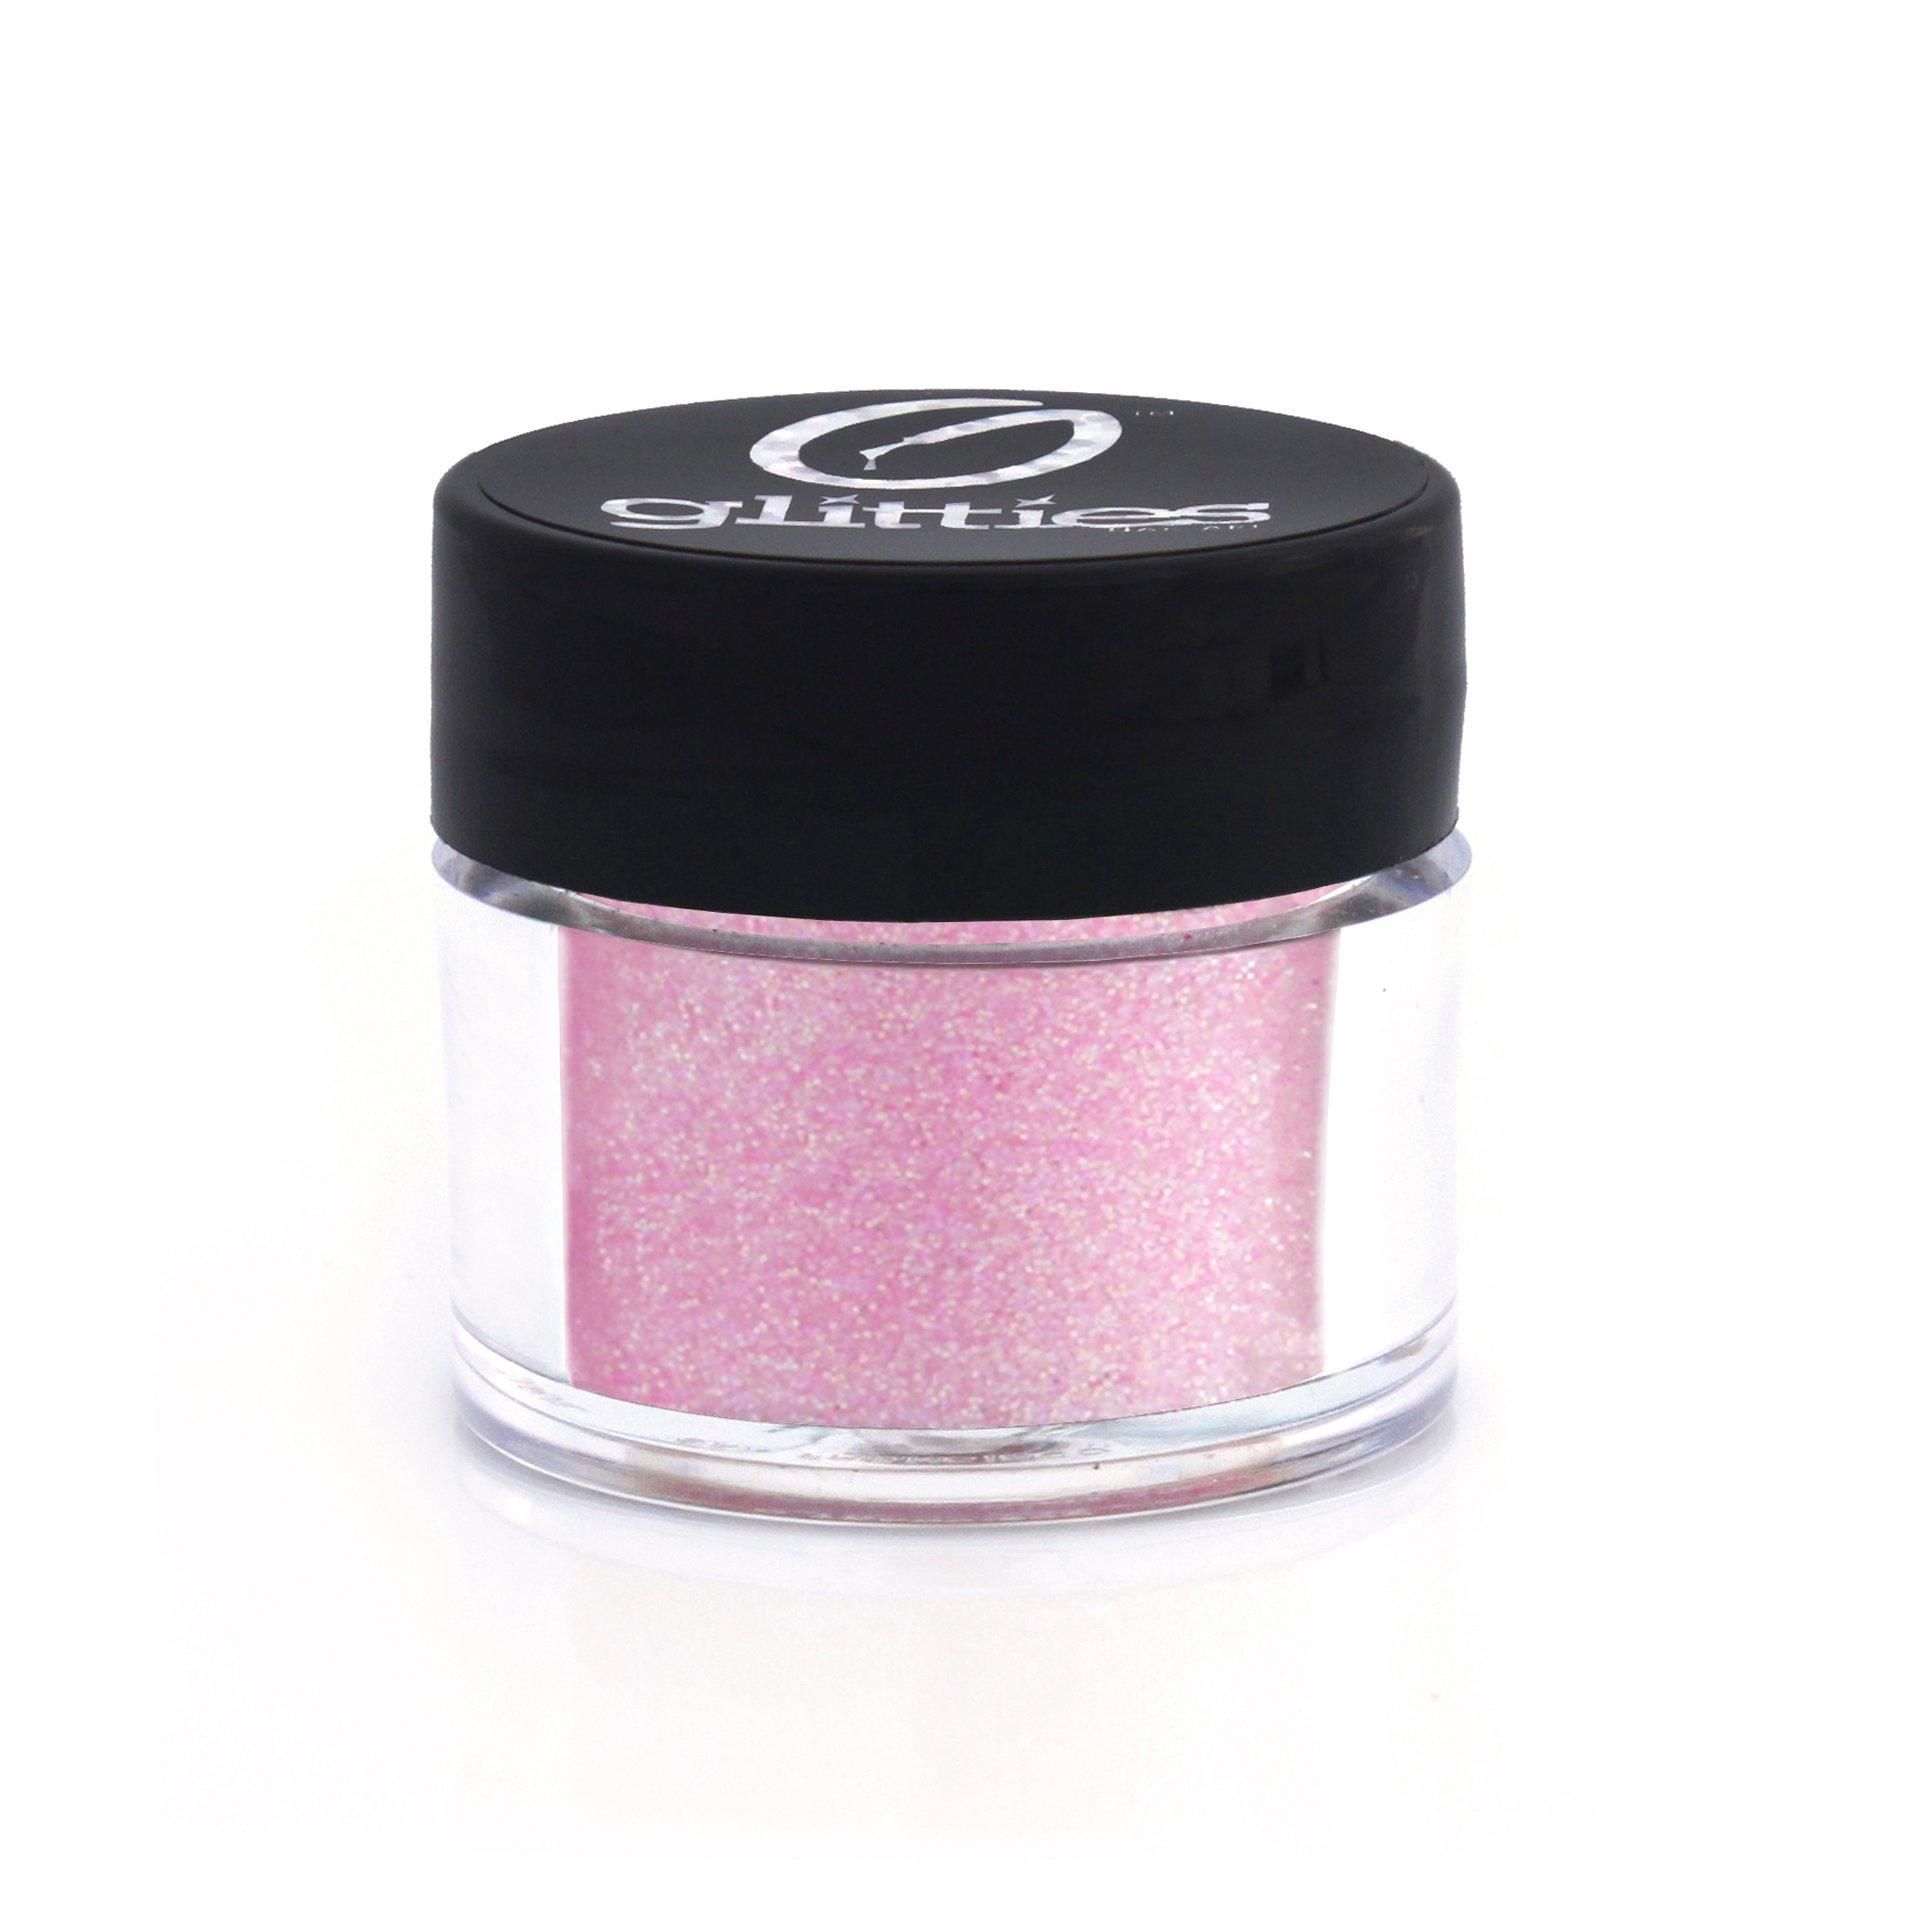 Amazon.com: Iridescent glitter powder for nail art, gel nail polish ...